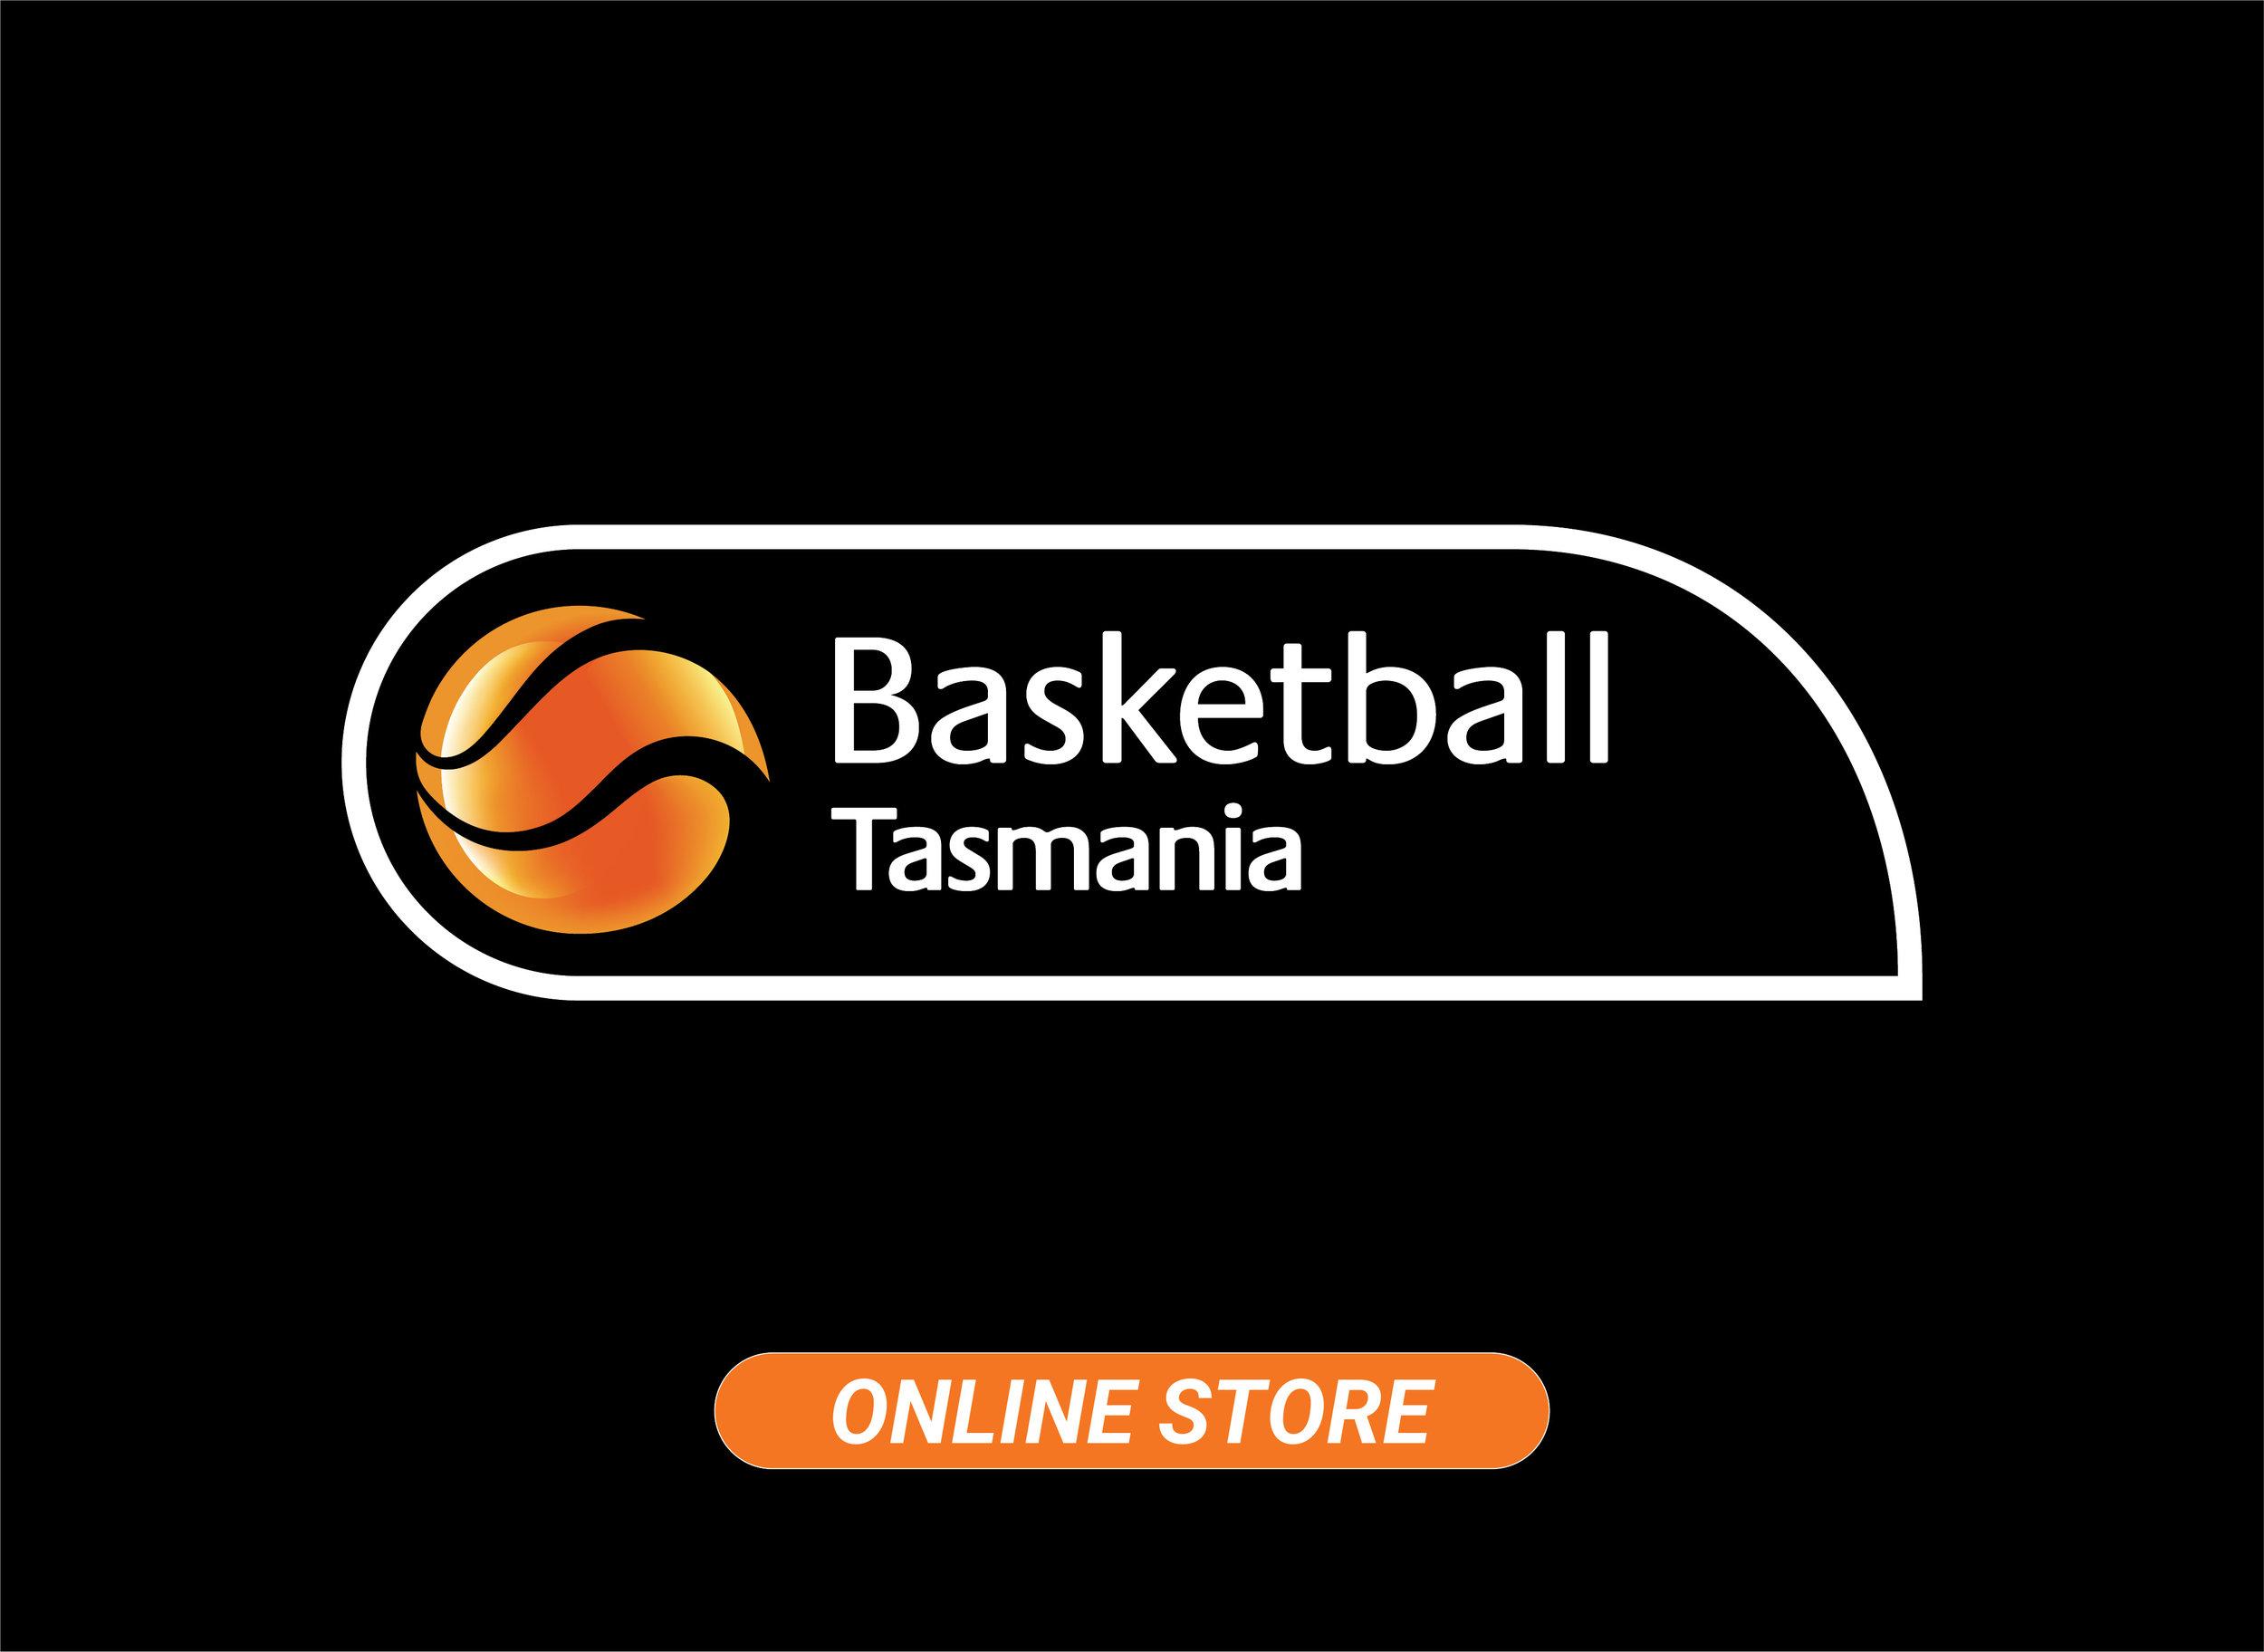 https://bbt.Ontracksportswear.com.au